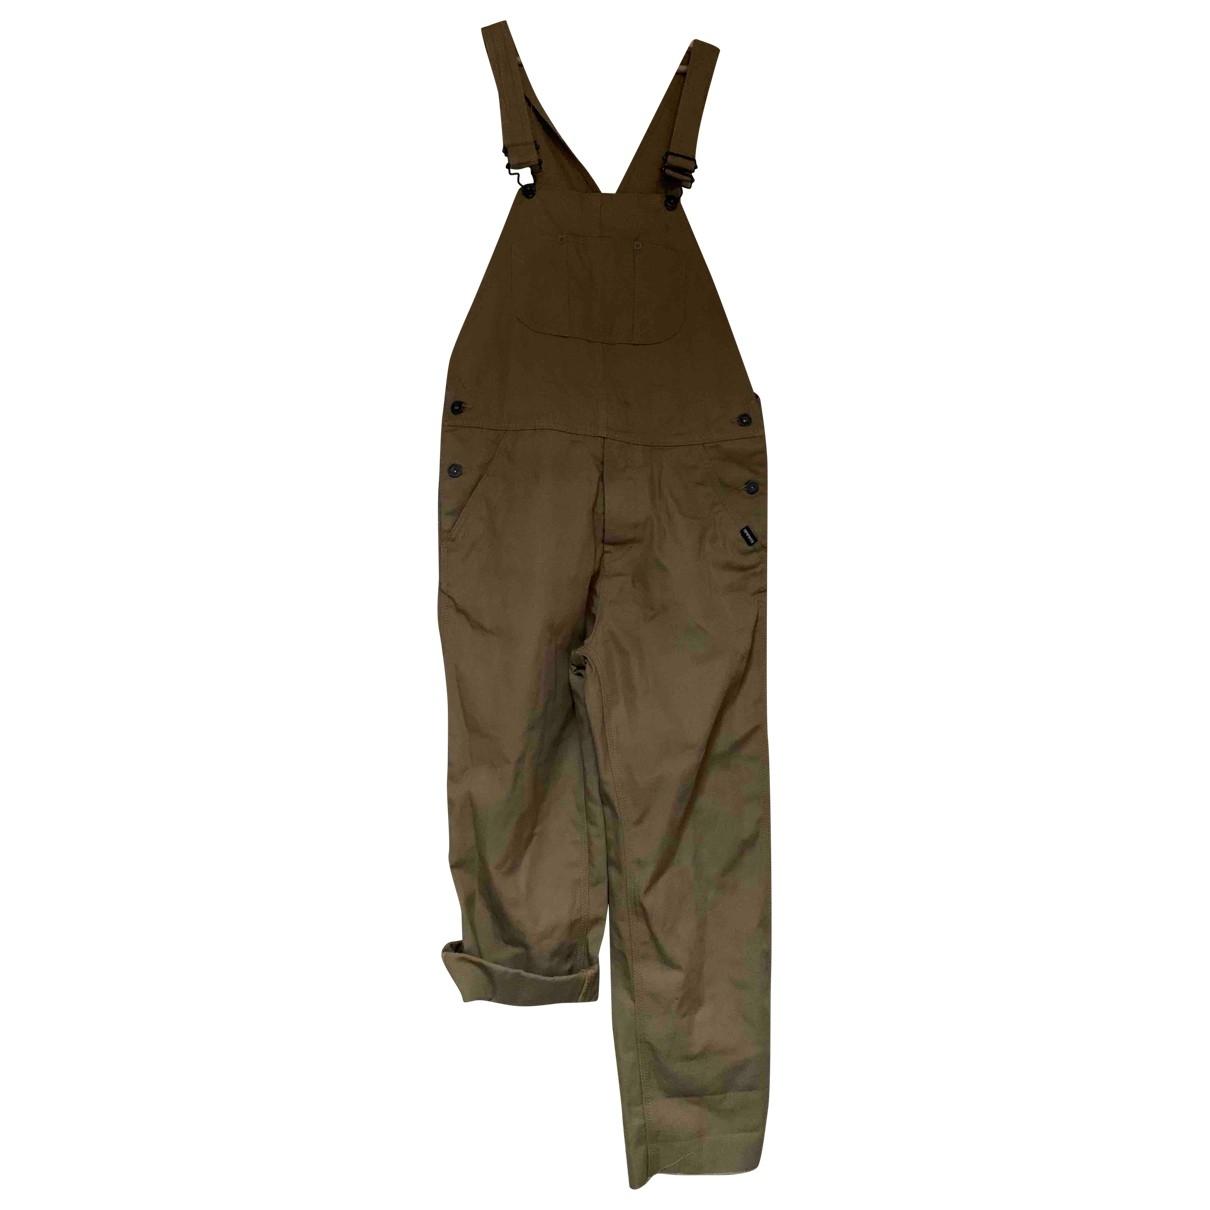 Napapijri \N Beige Cotton jumpsuit for Women XS International